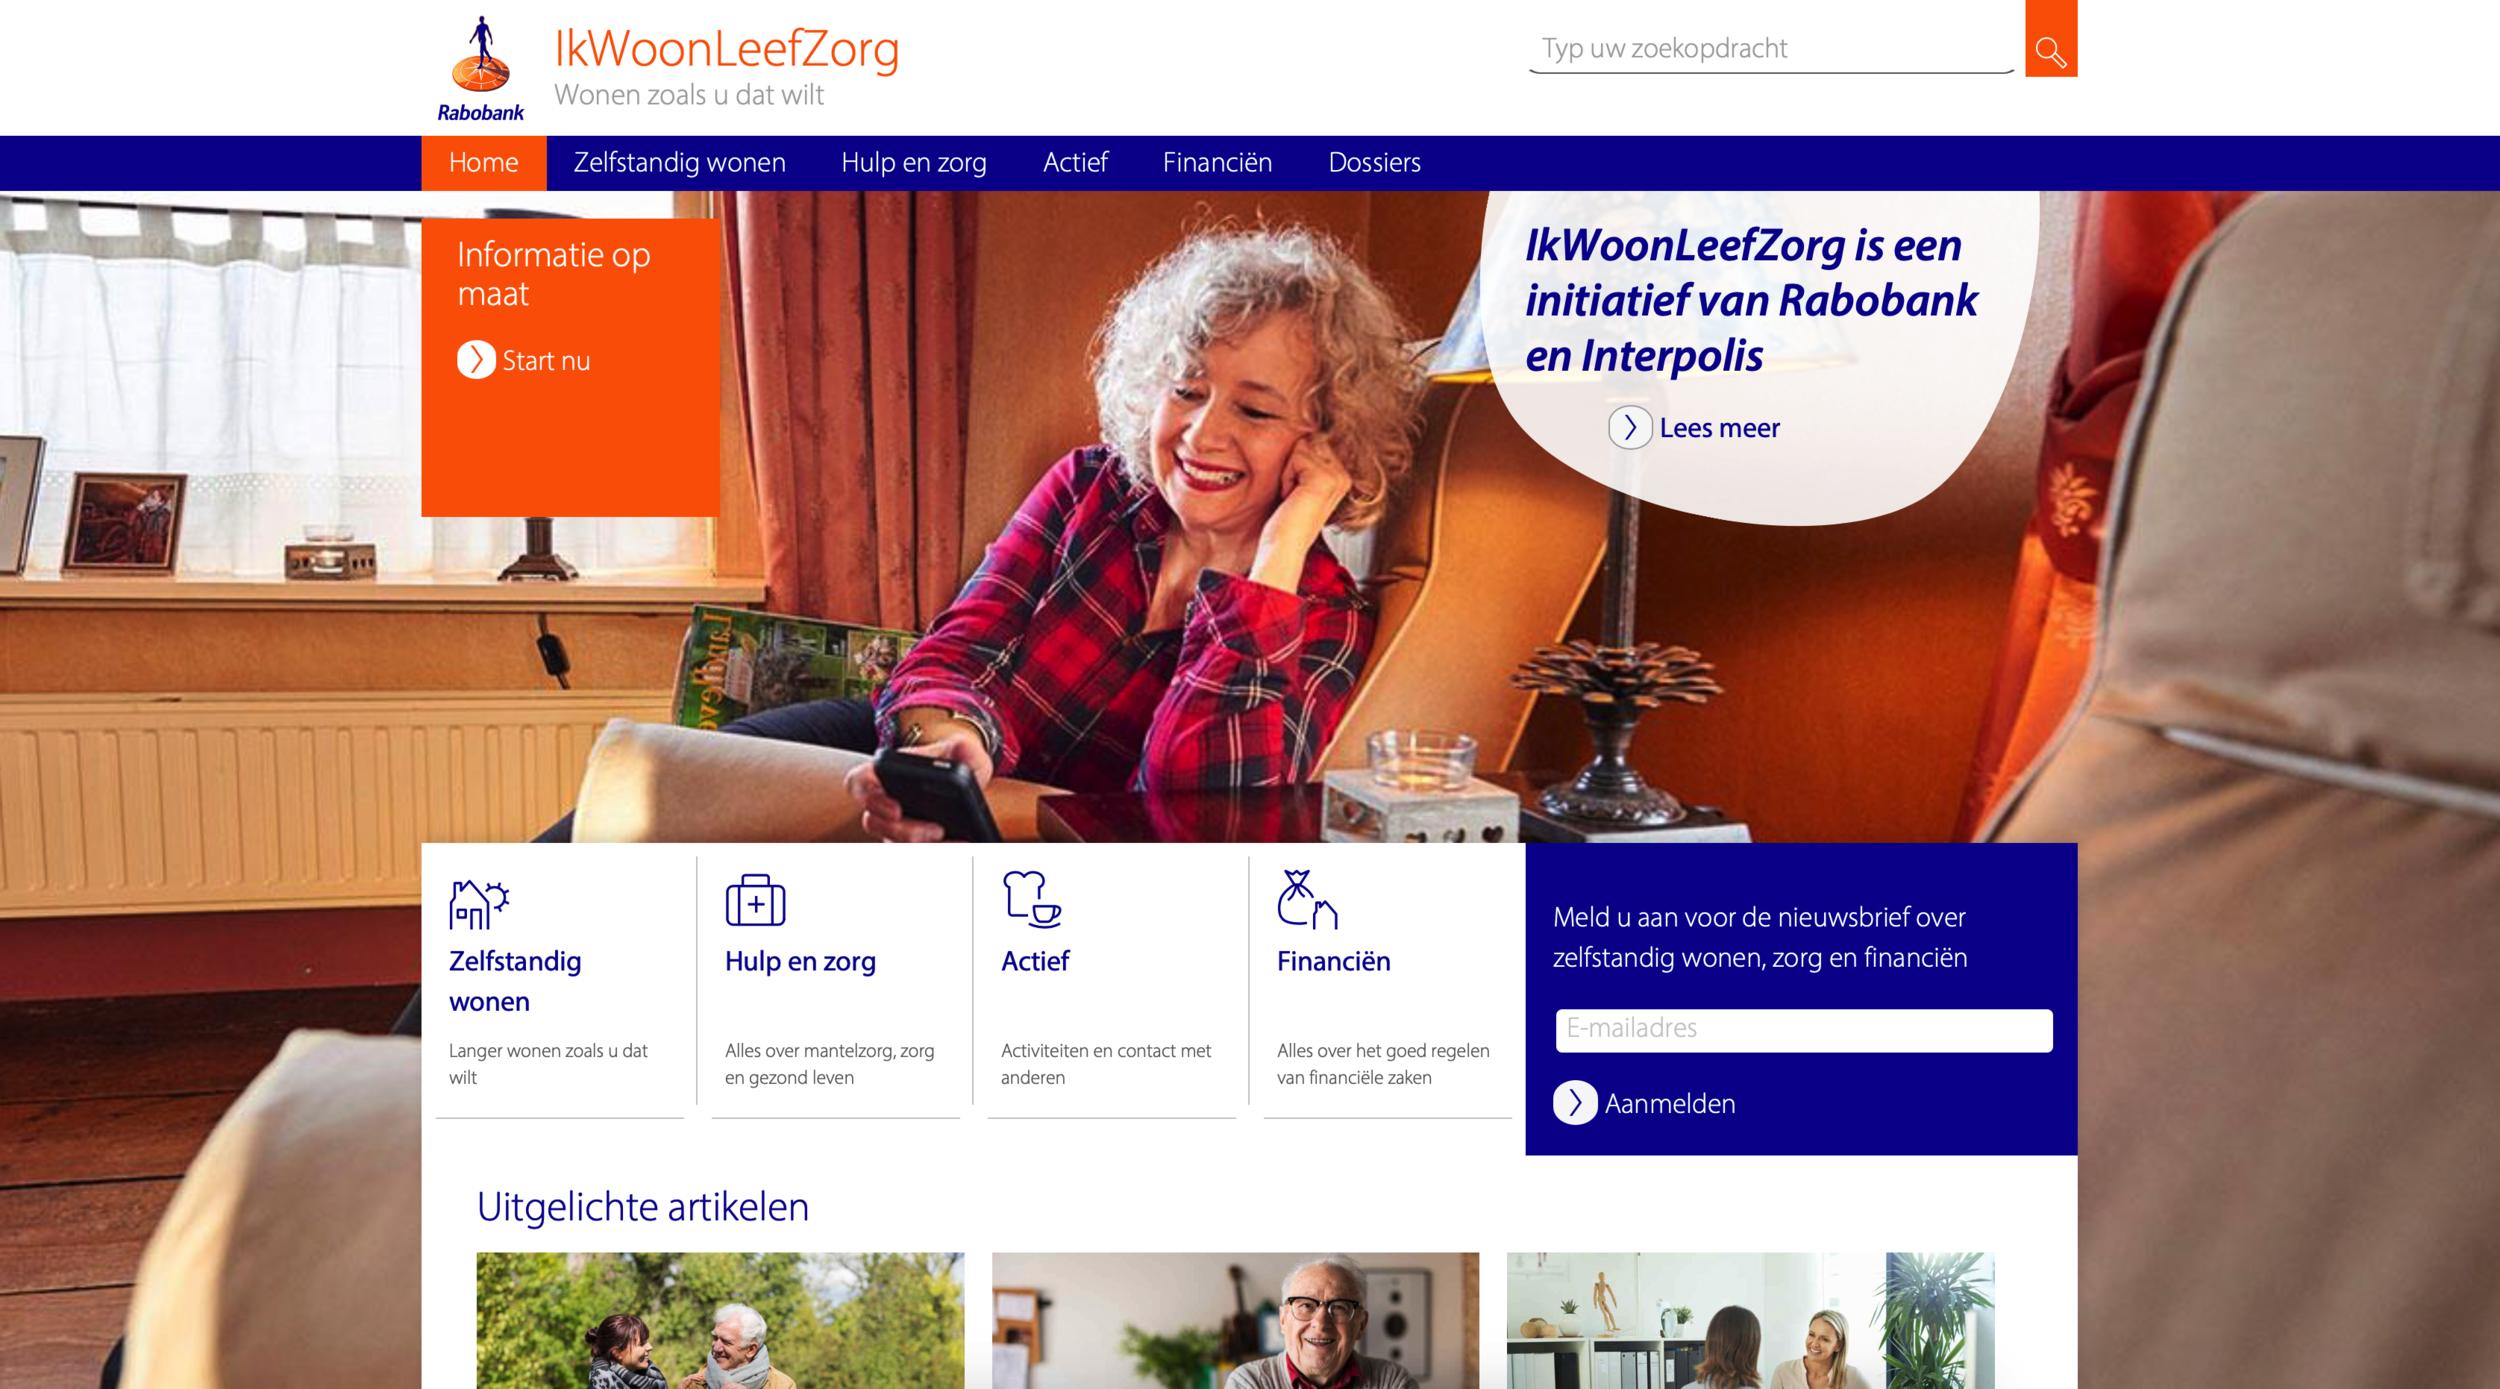 www.ikwoonleefzorg.nl